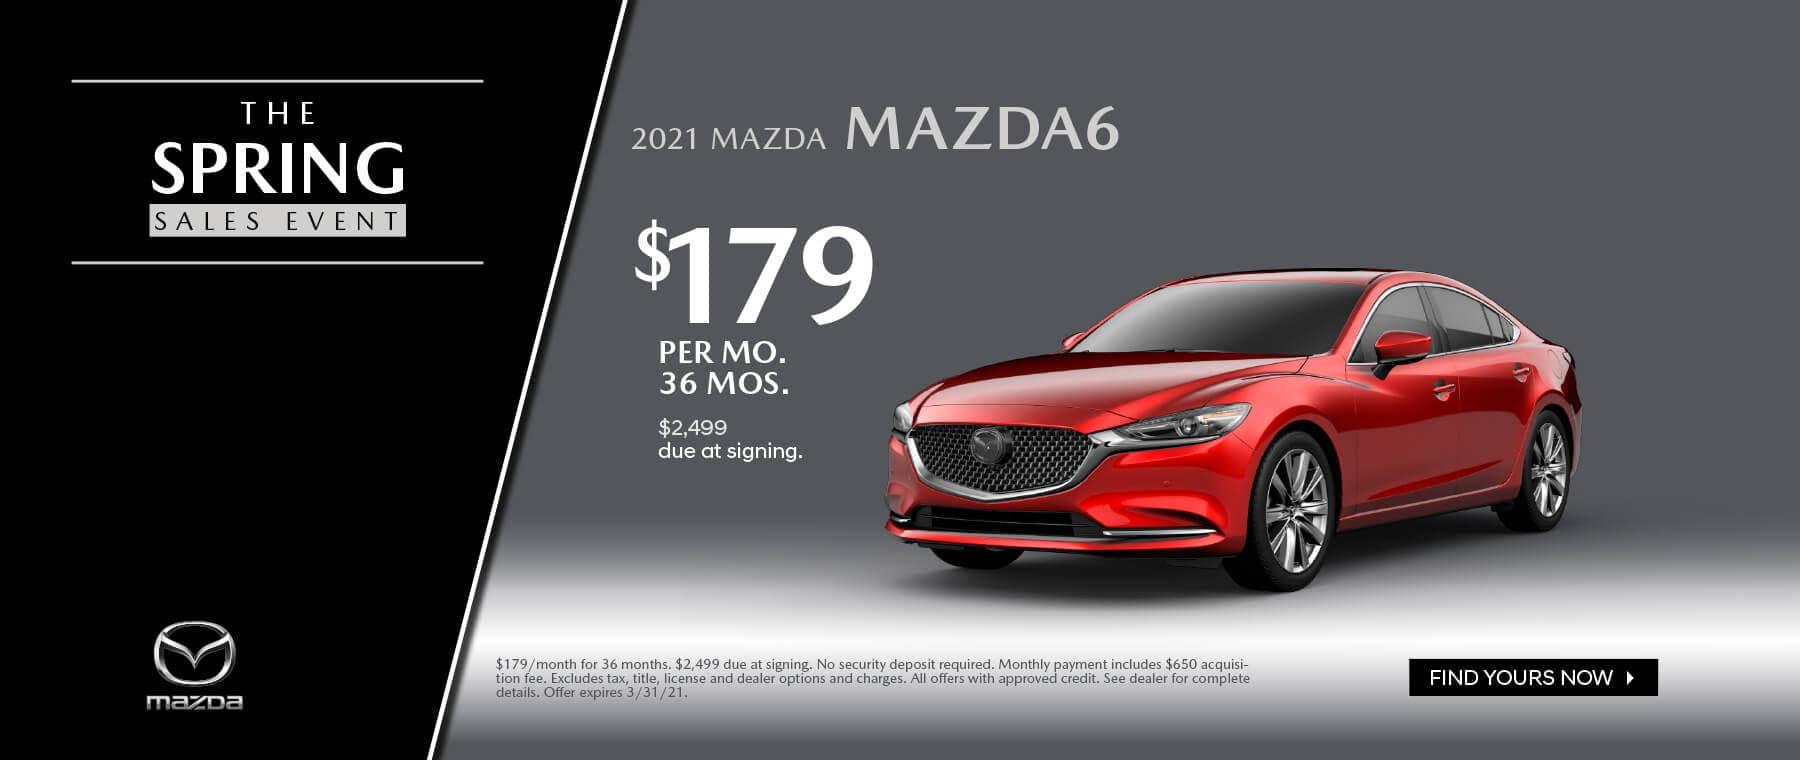 2021.02.24-Keffer-Mazda-MAR-Web-Banners-S51082vw-5